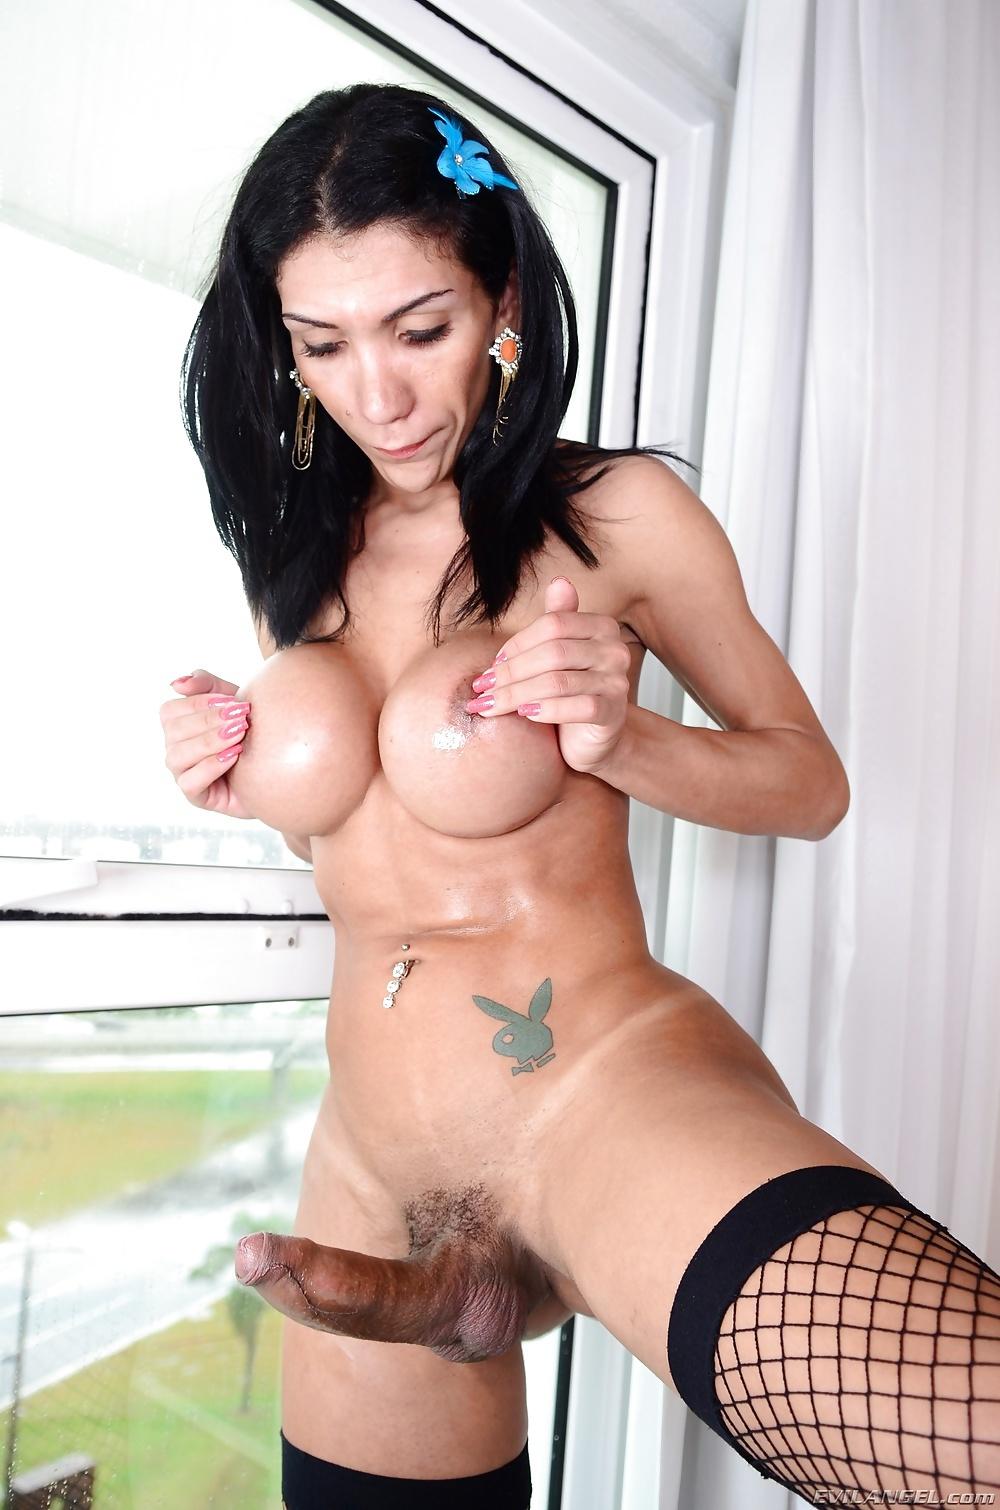 Aubrey belle hot